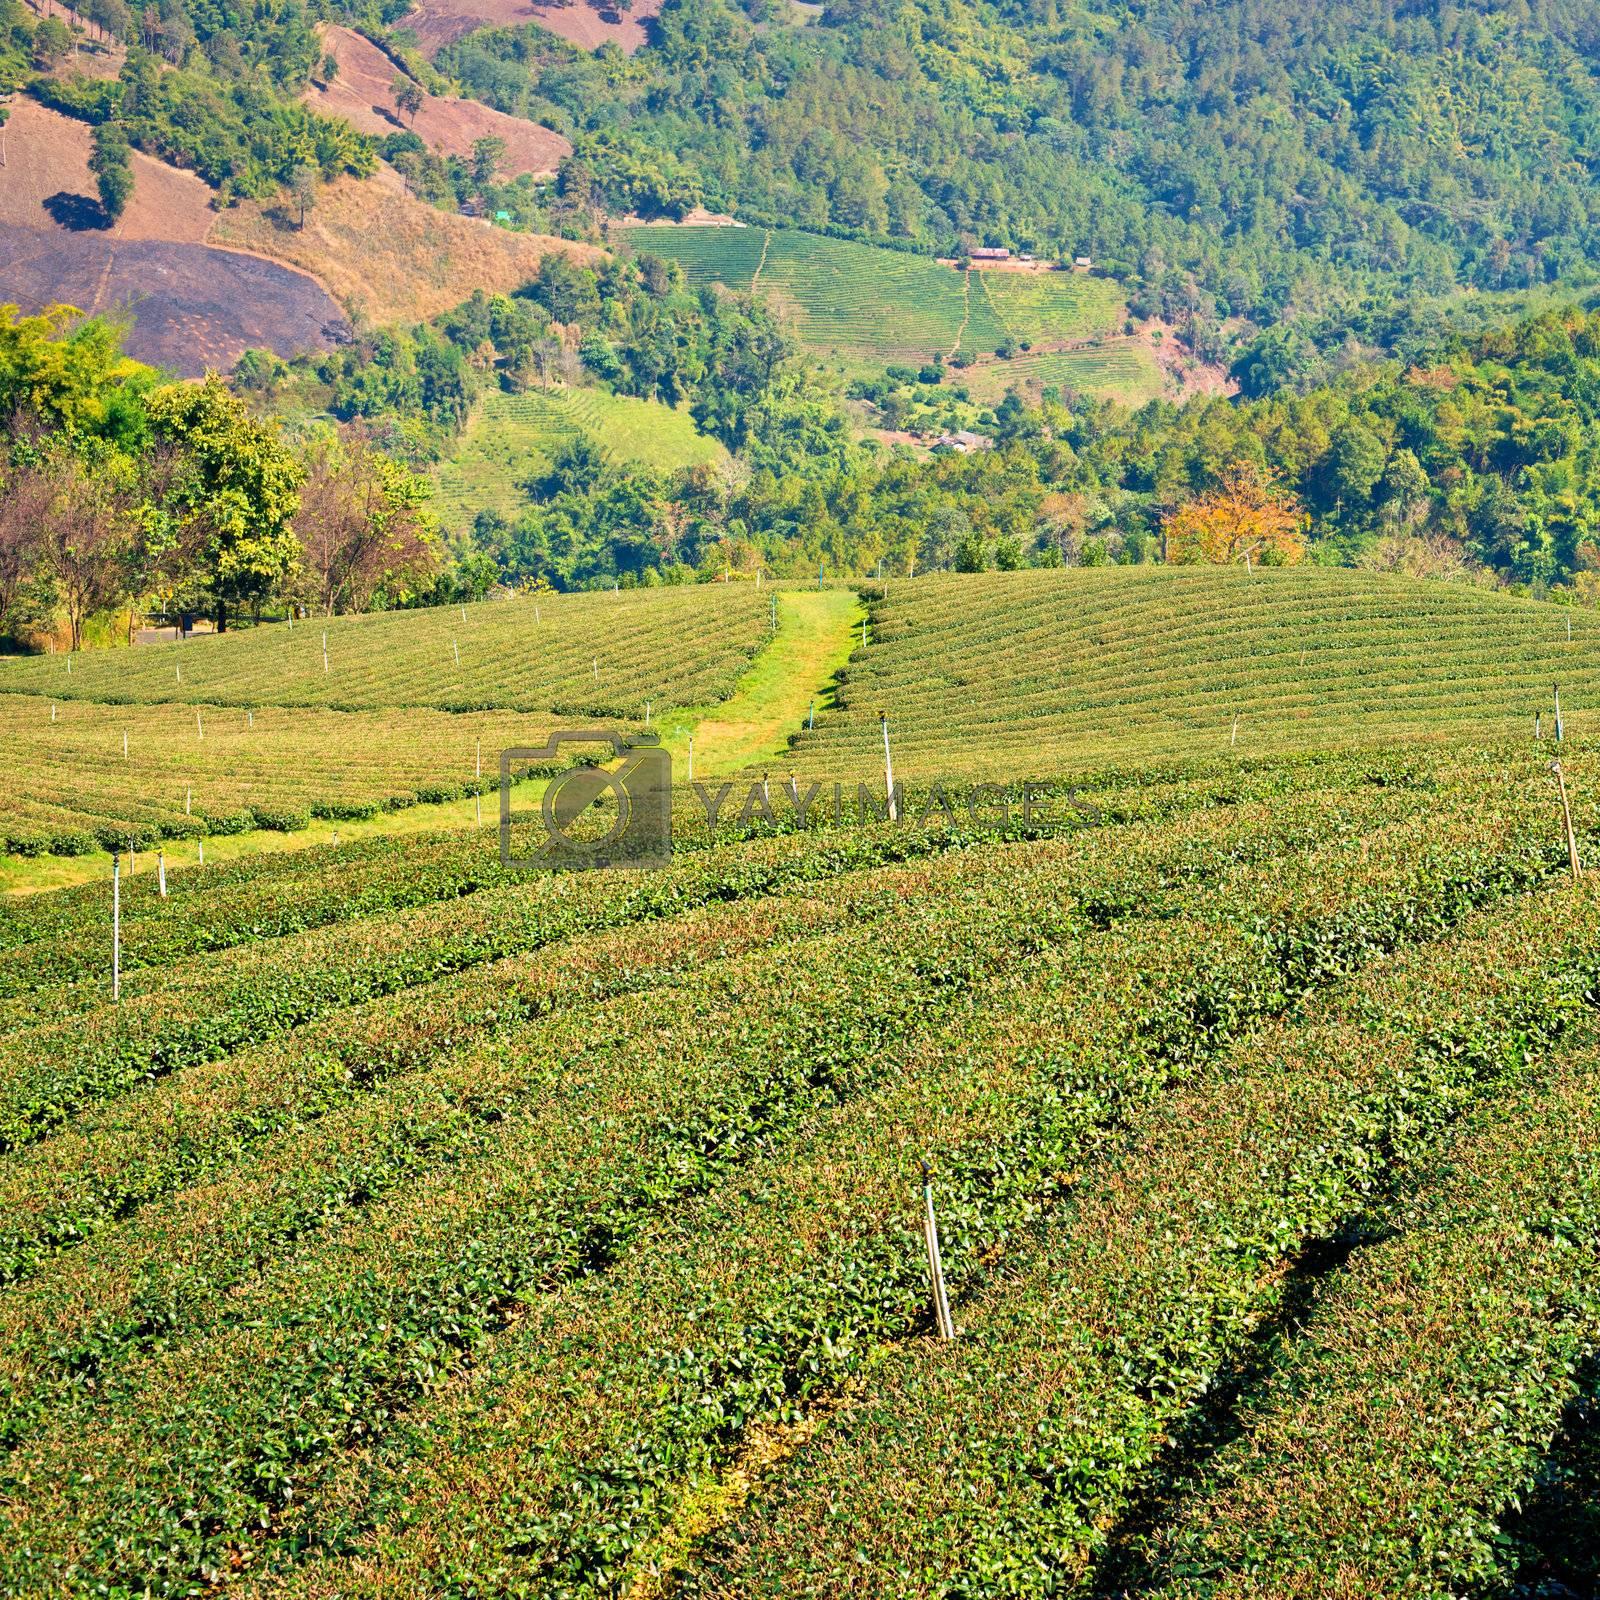 Tea plantation in village Mae Salong, Chiang Rai, Chiang Mai province, Thailand